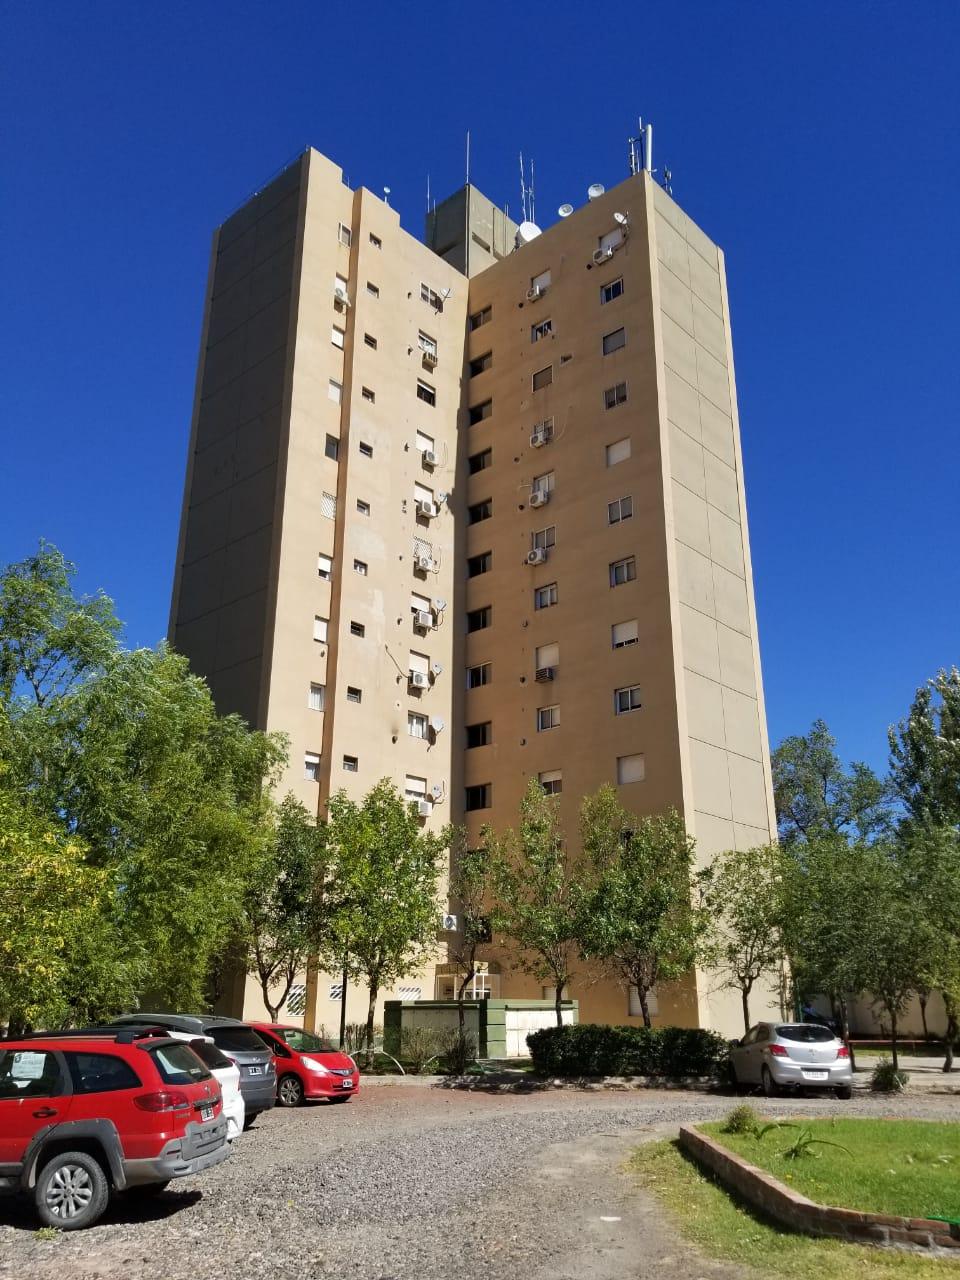 Departamento en Neuqu�n, Terrazas De Neuquen   MEM360   Mercado Inmobiliario